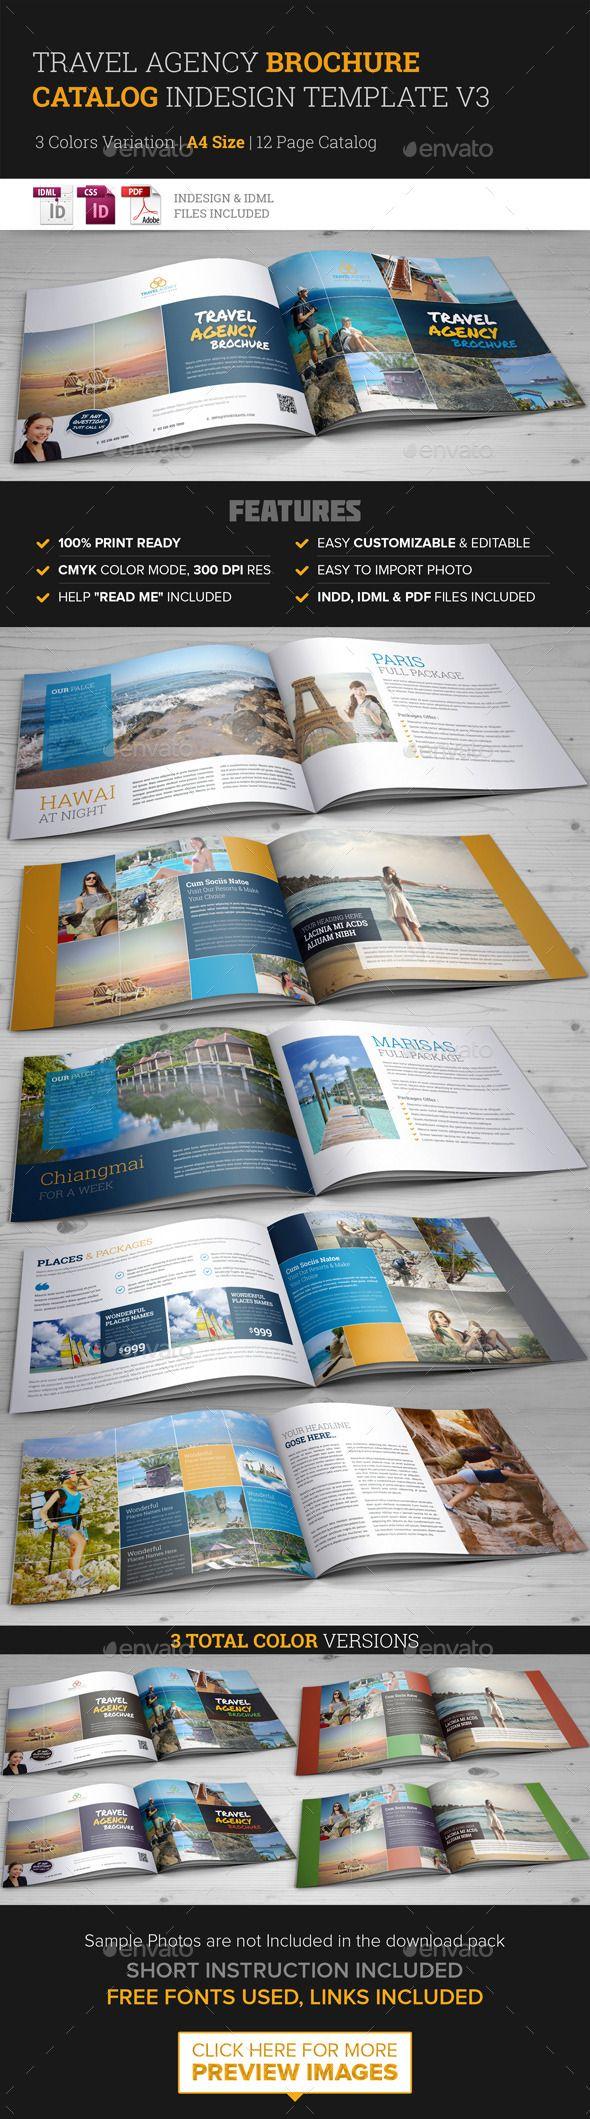 Travel Agency Brochure Catalog InDesign Template 3 | Pinterest ...